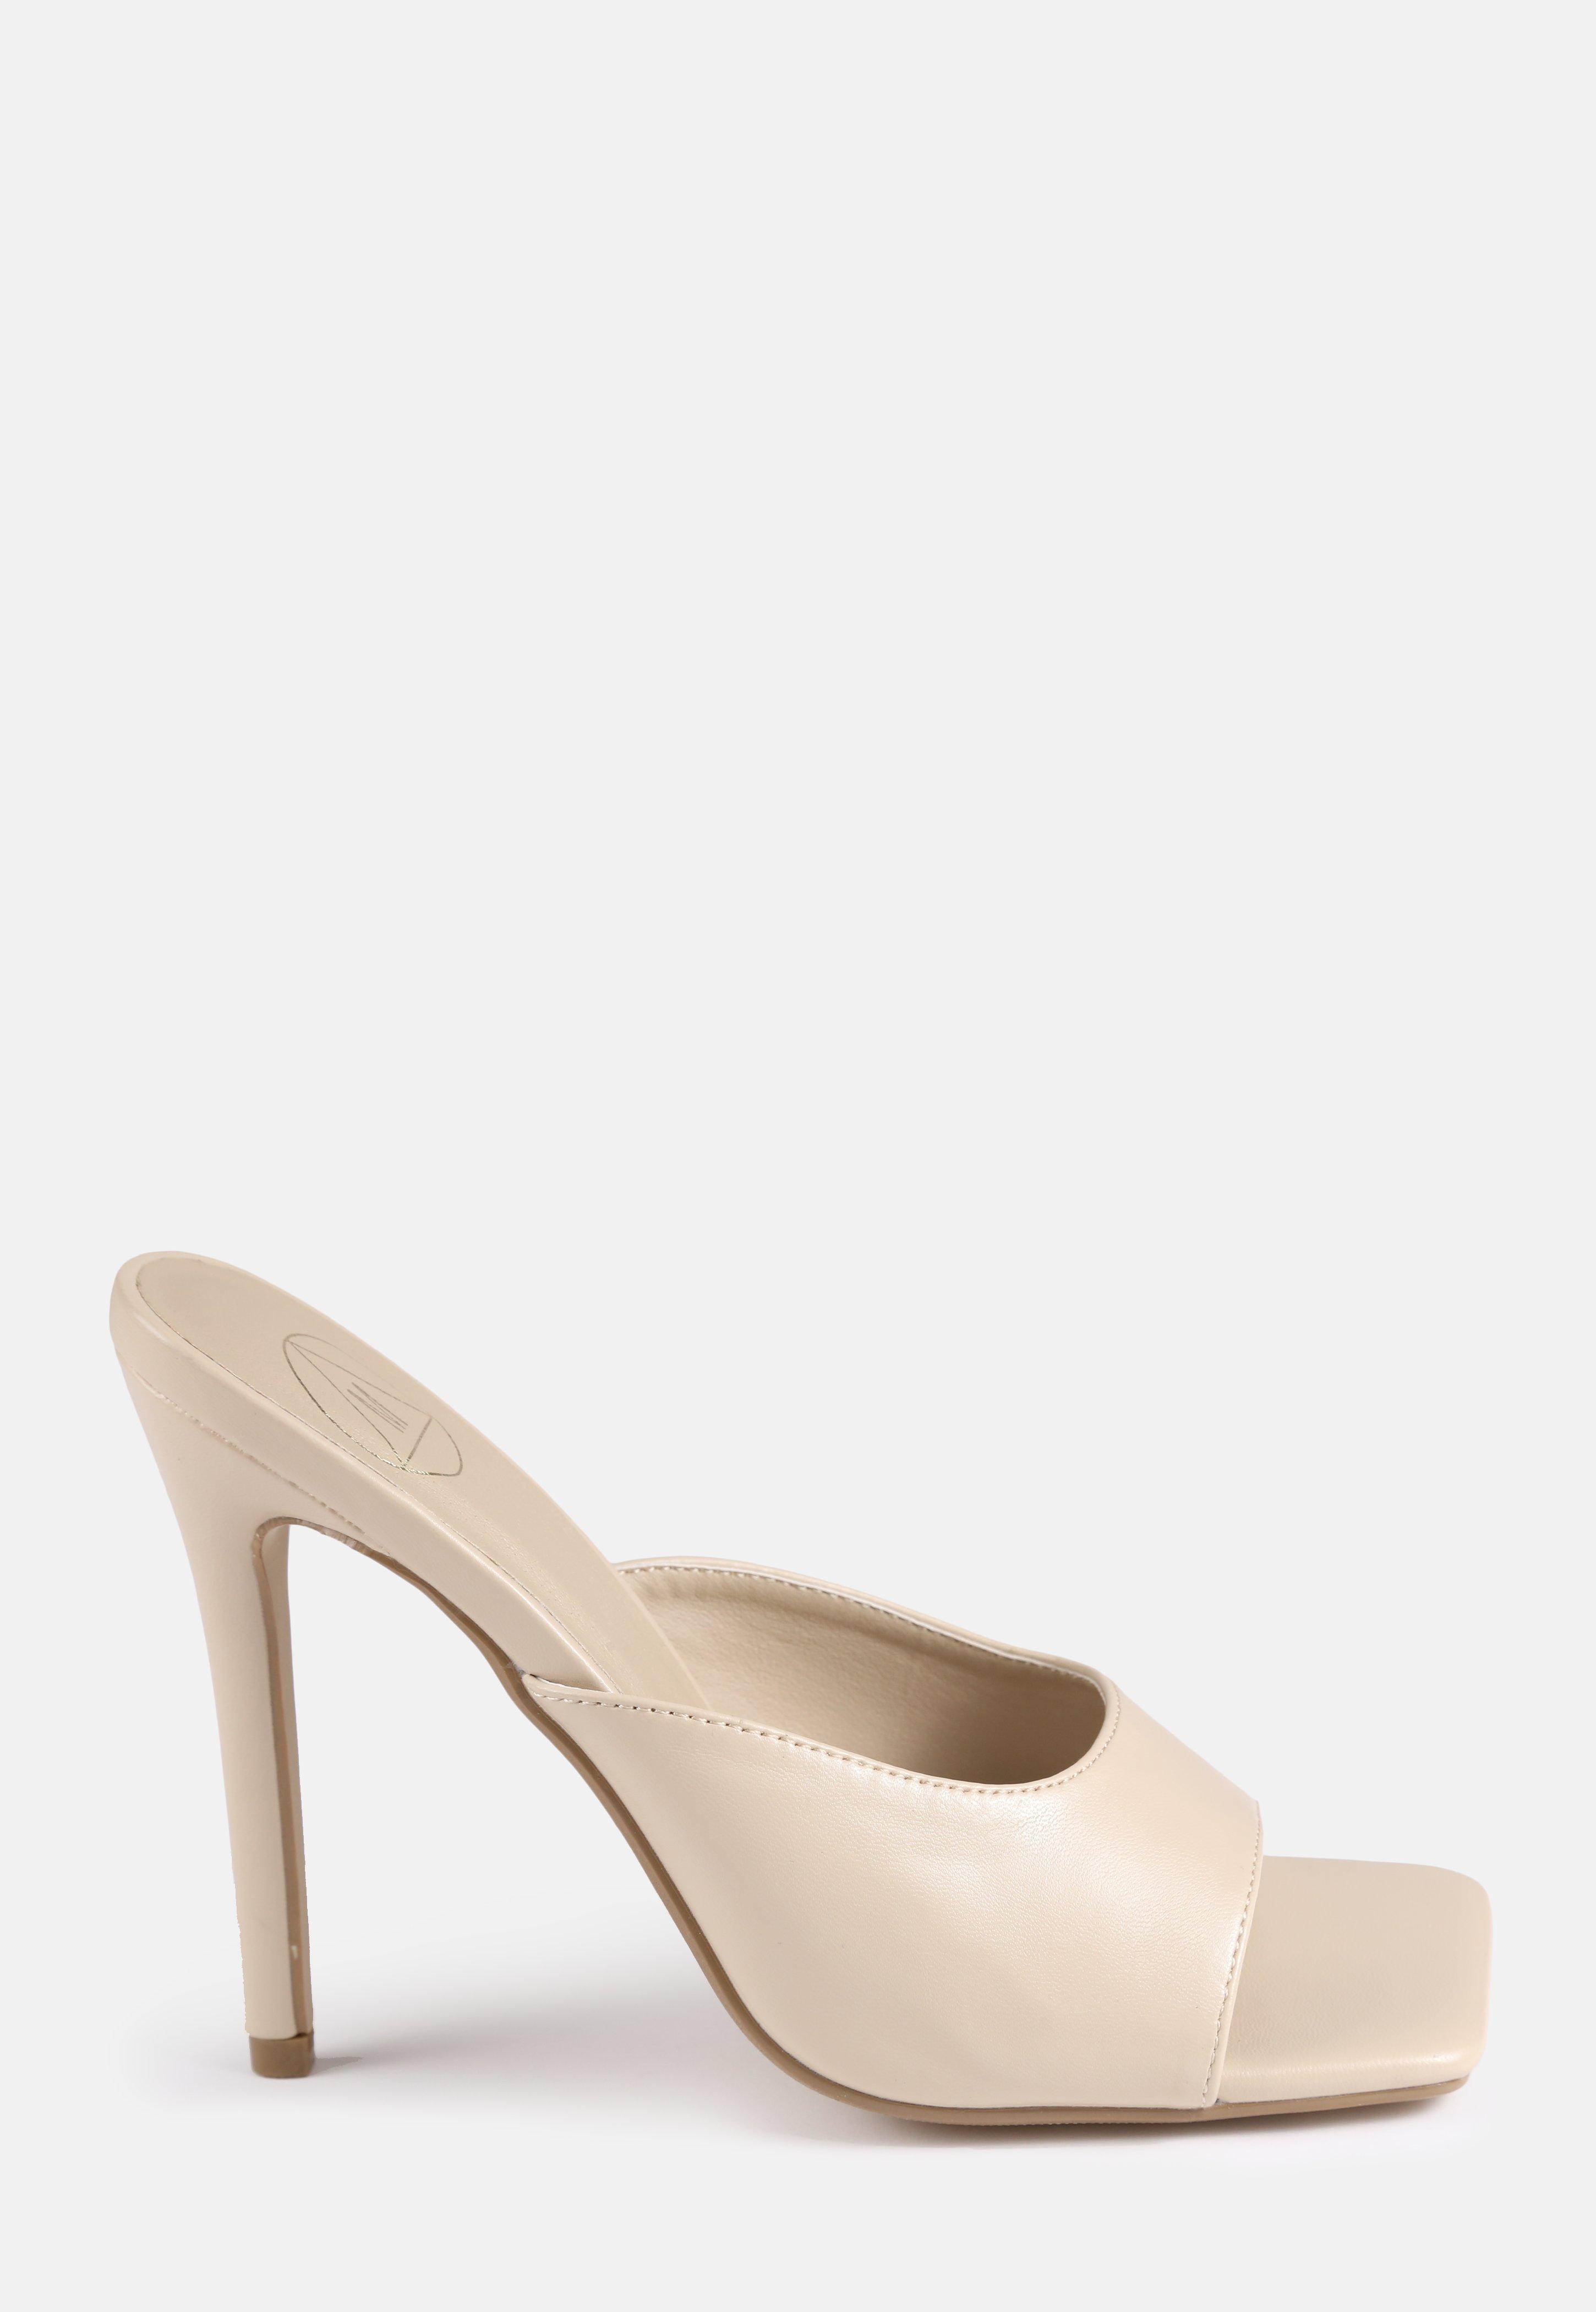 Mules   Heel Mules   Mules Shoes